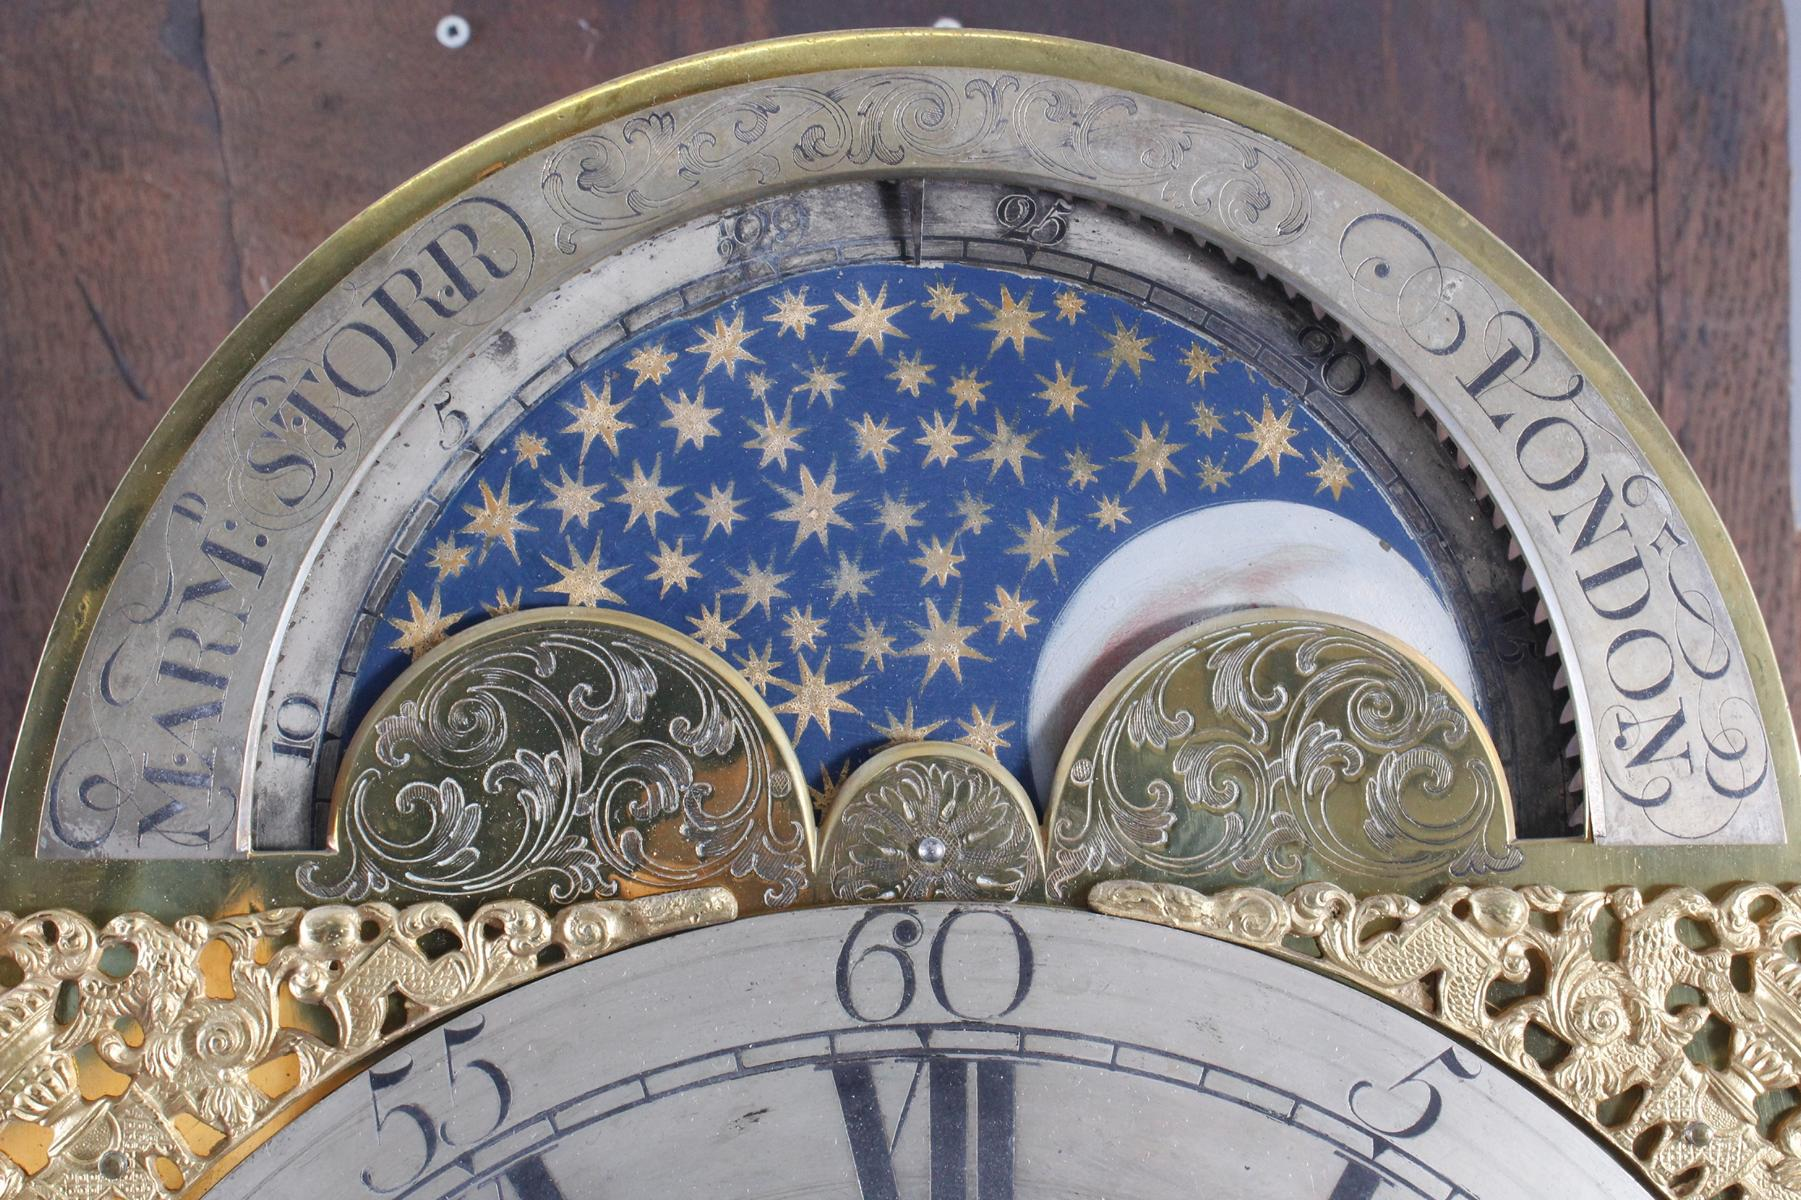 Barocke Standuhr, 18. Jh., Mondphase, Marm Storr London-4